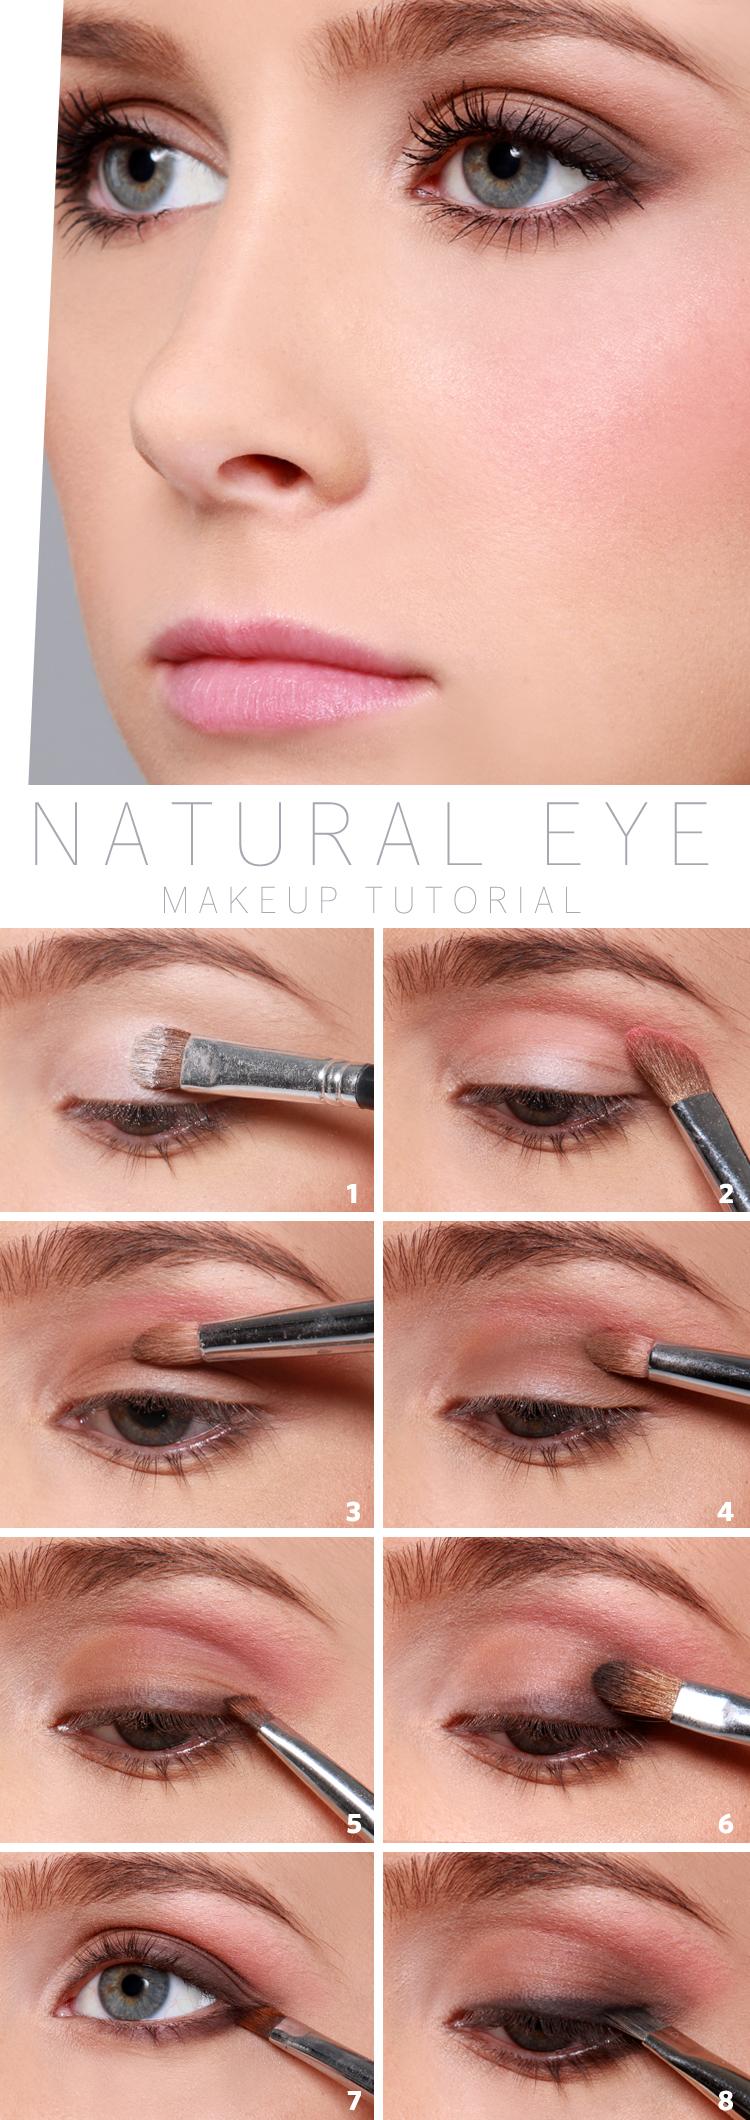 Beauty Tips: Natural Eyeshadow Tutorial